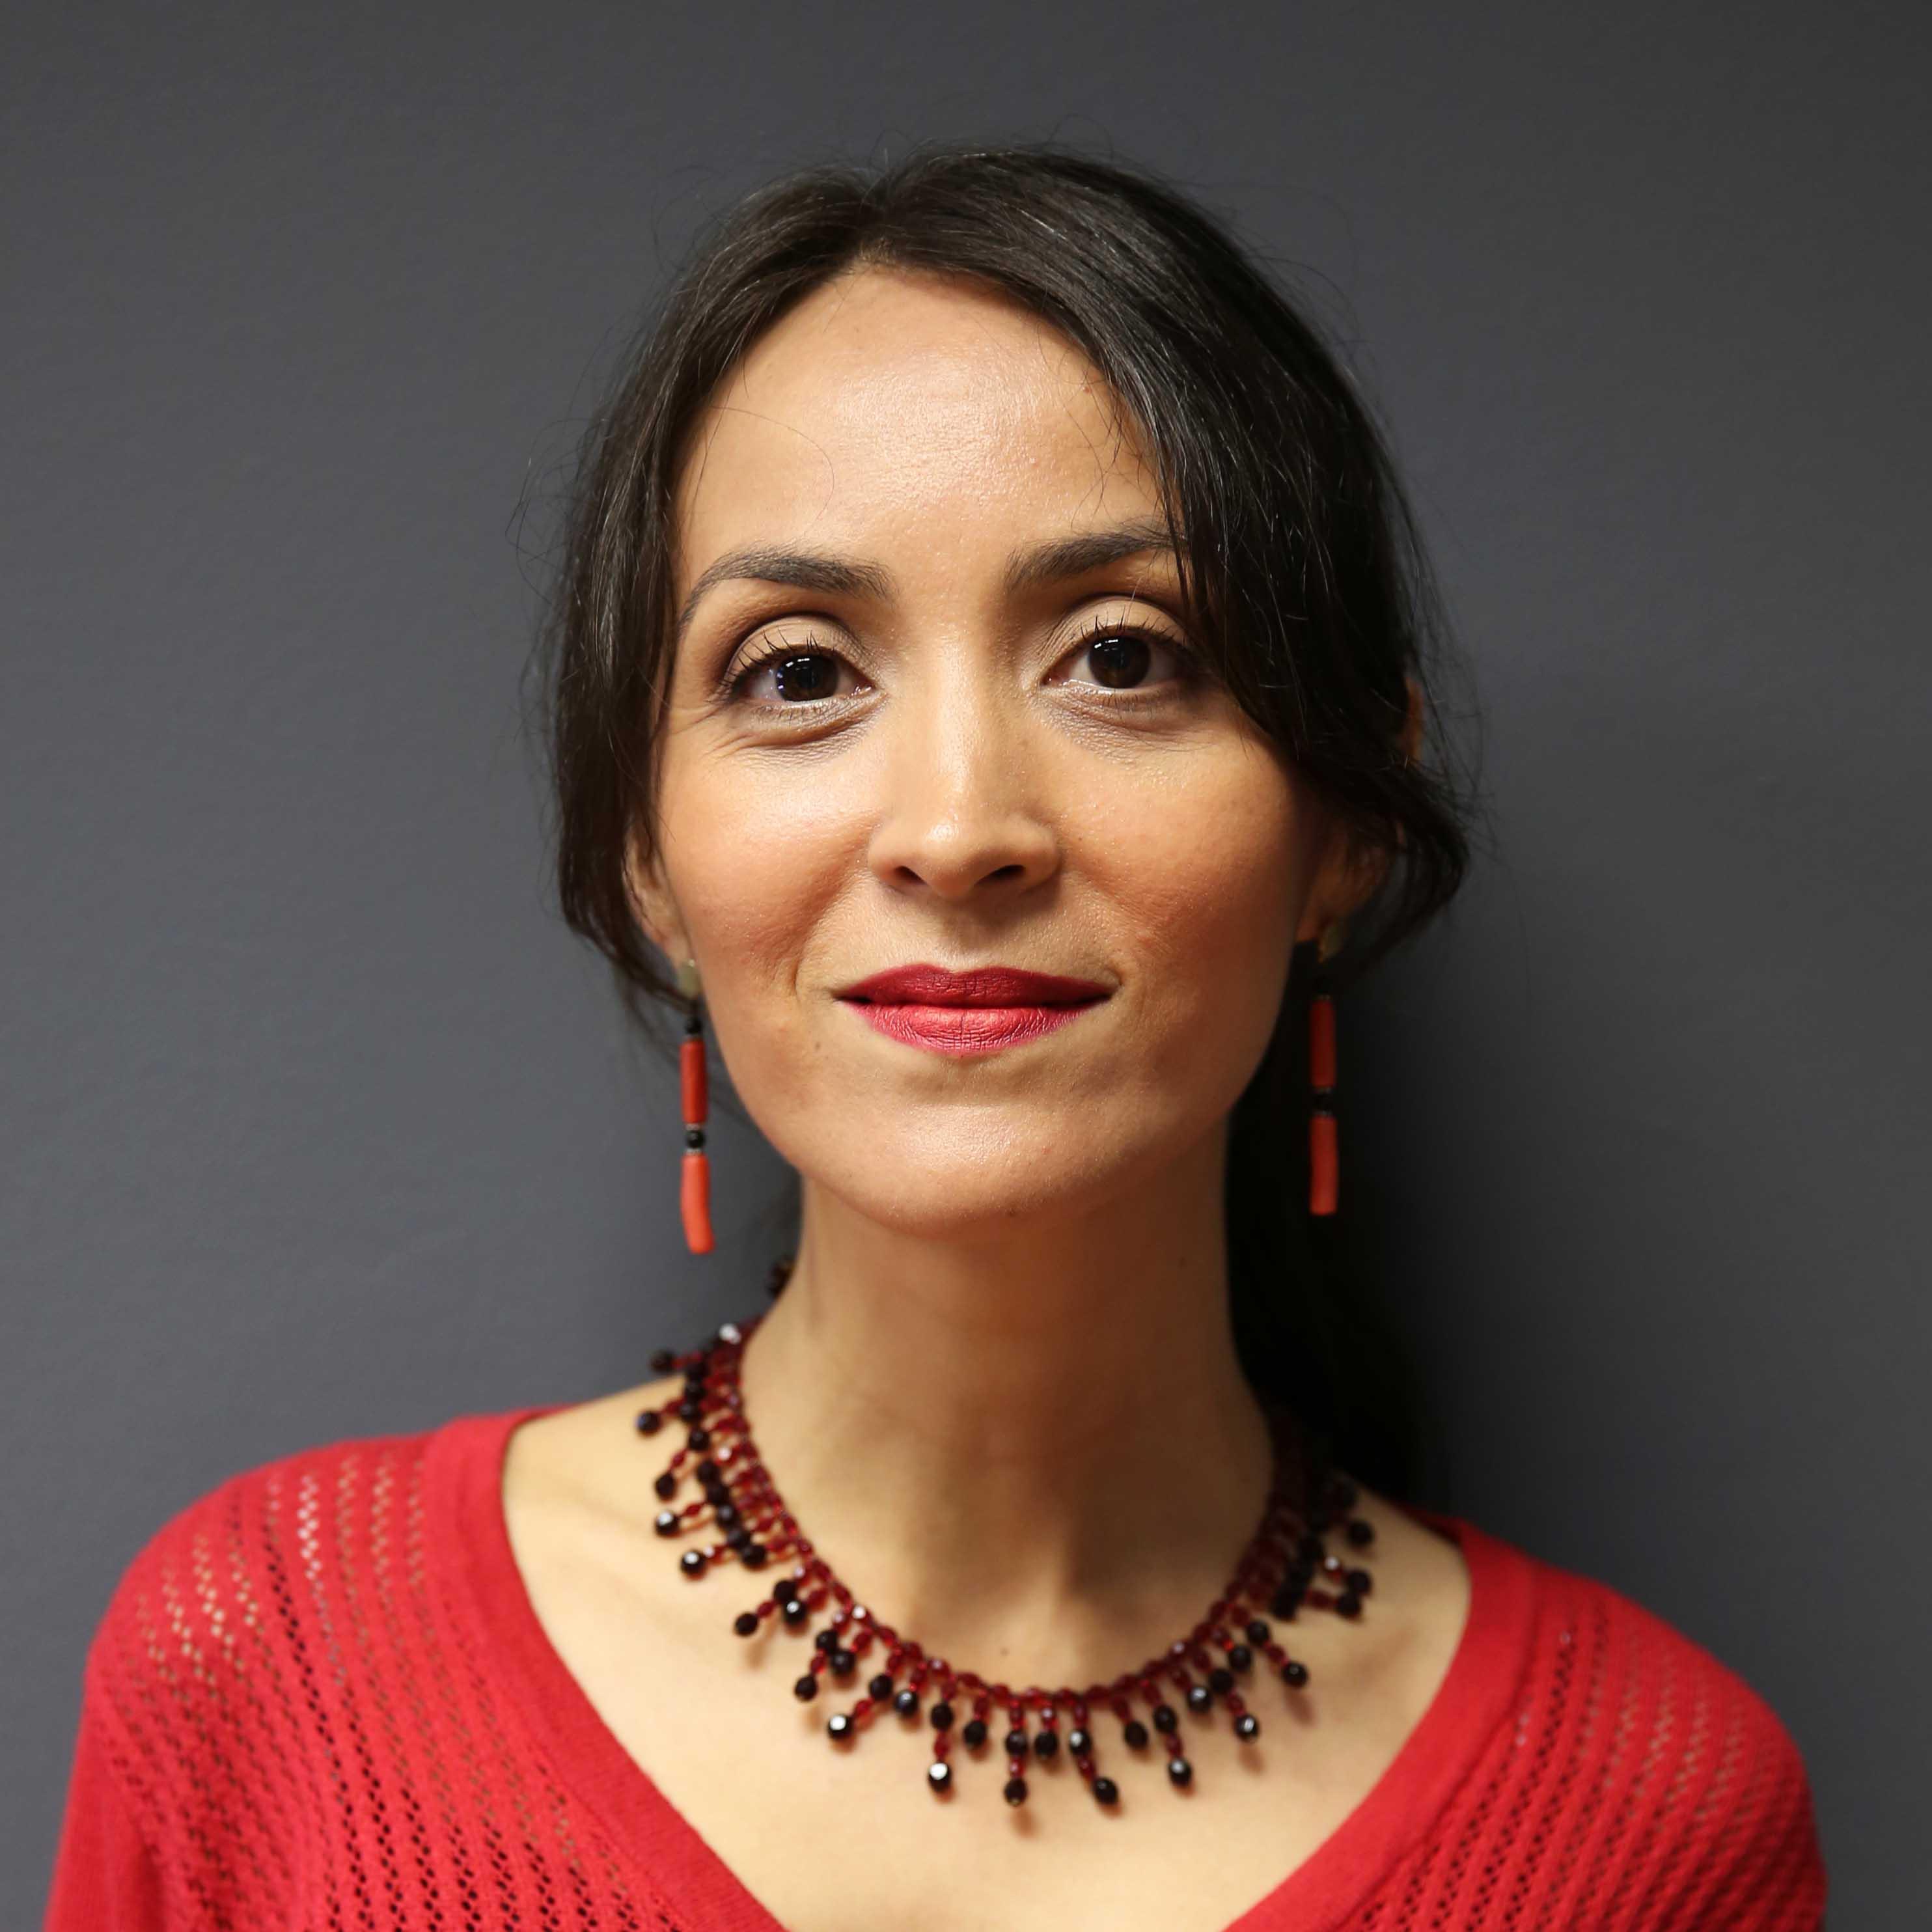 Photograph of Diana Roig